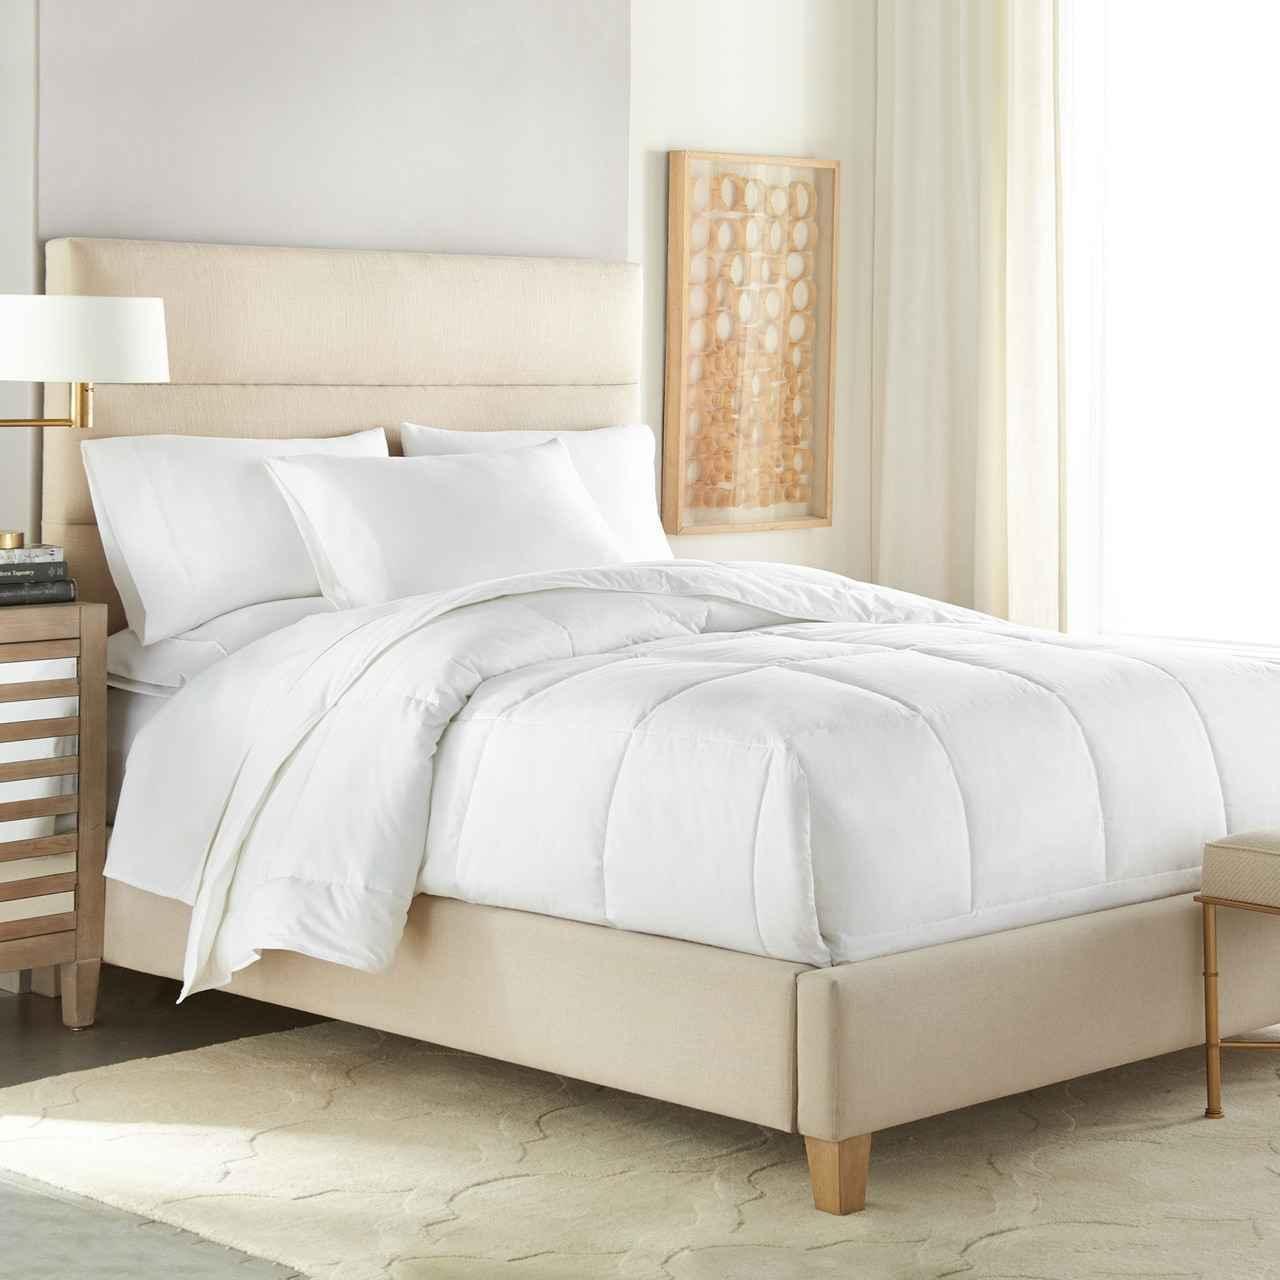 Enviroloft Luxury Hotel Down Alternative Comforters